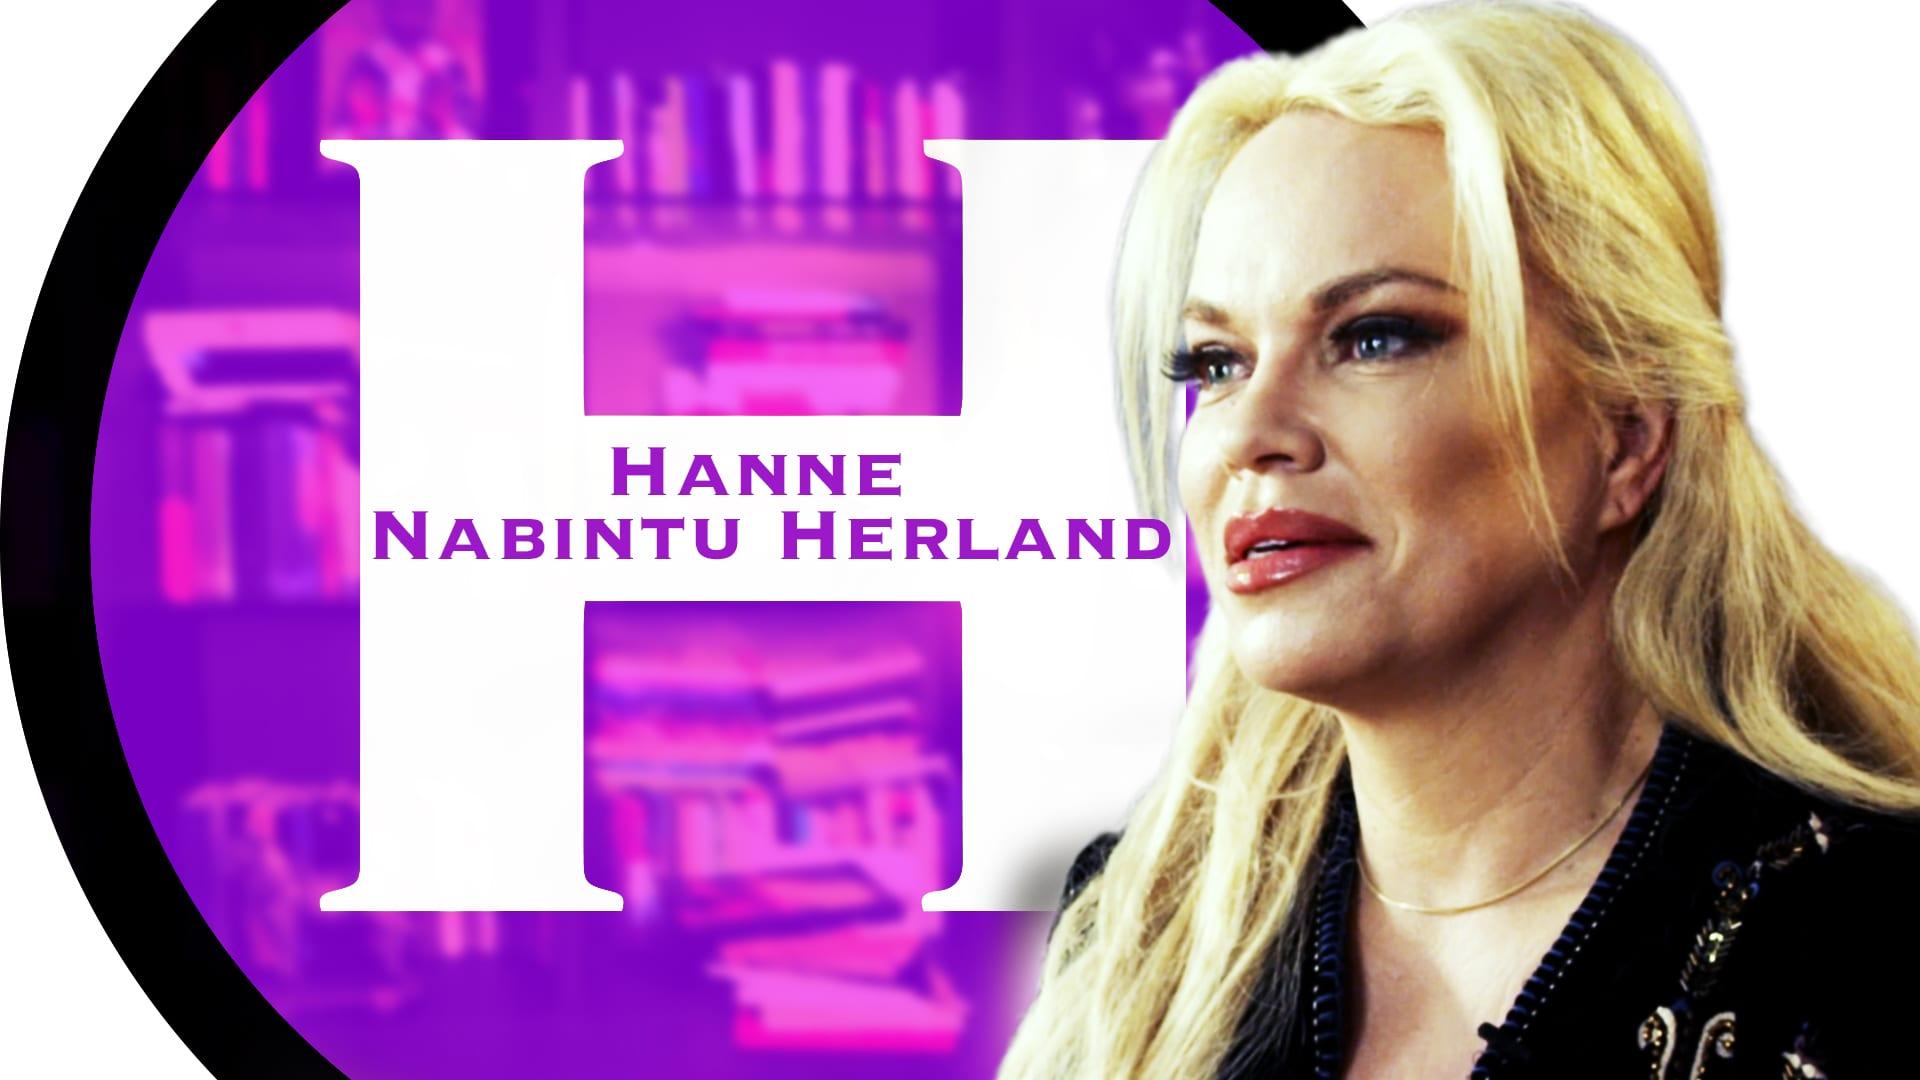 Orwellian censorship in social media: Internet free speech being shut down, Hanne Nabintu Herland, WND, Herland Report